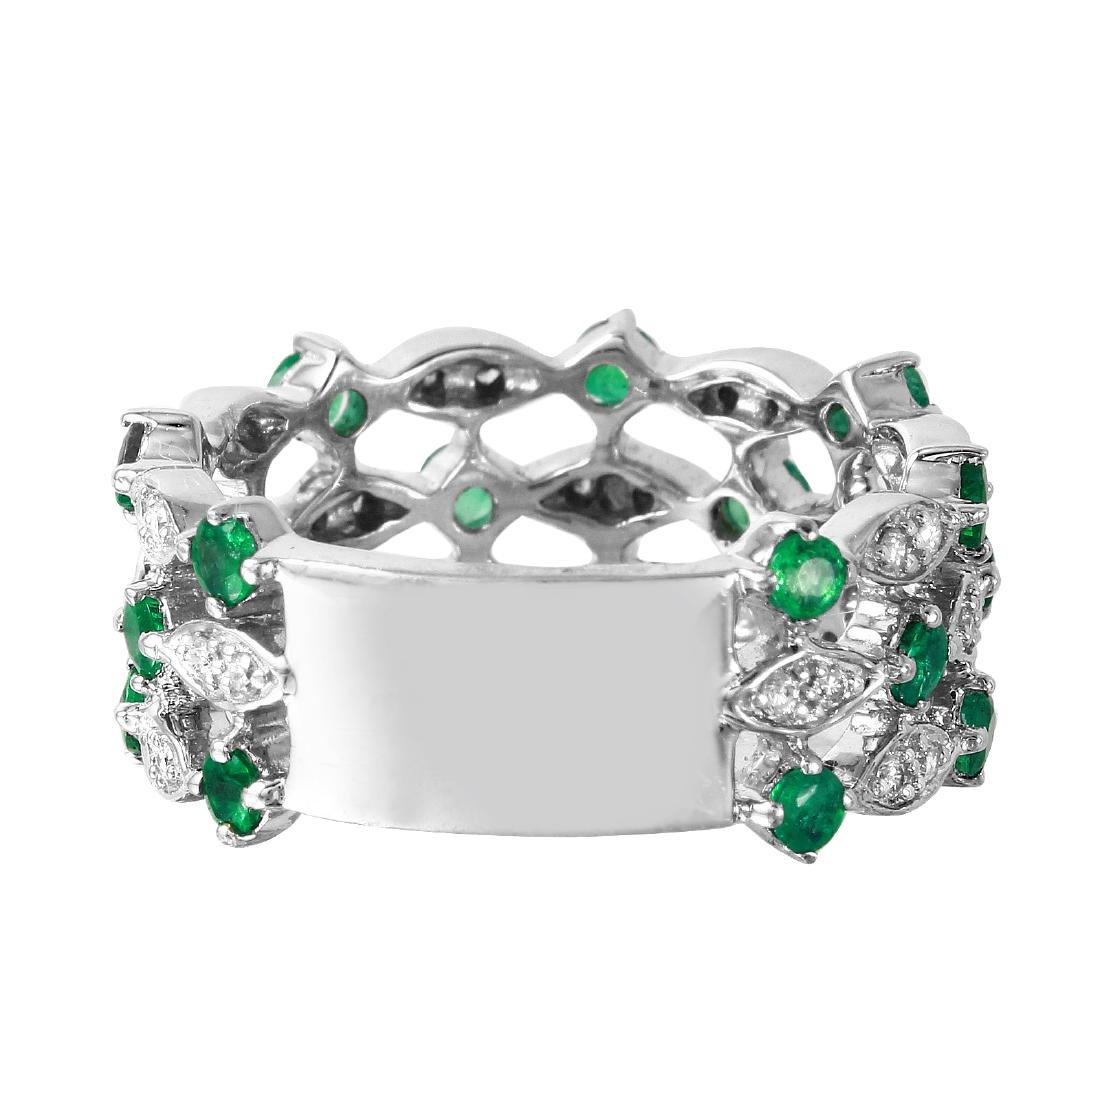 14KT White Gold 1.25ctw Emerald Diamond Ring Size 6.25 - 5